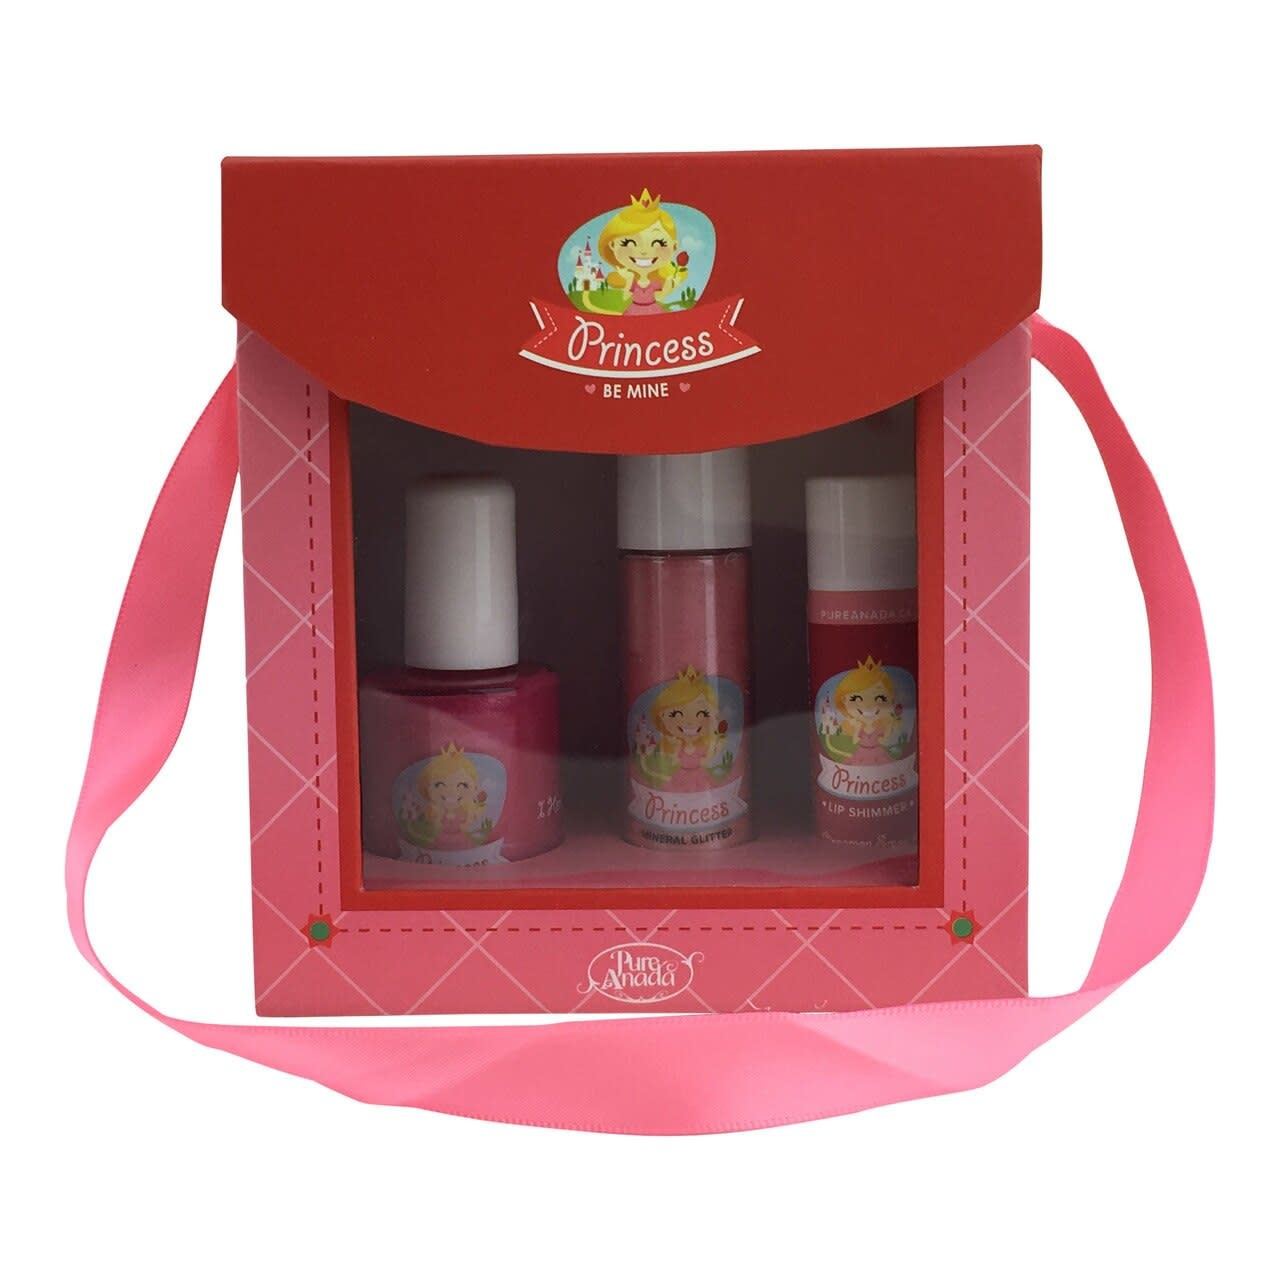 Princess Pack - Be Mine-1